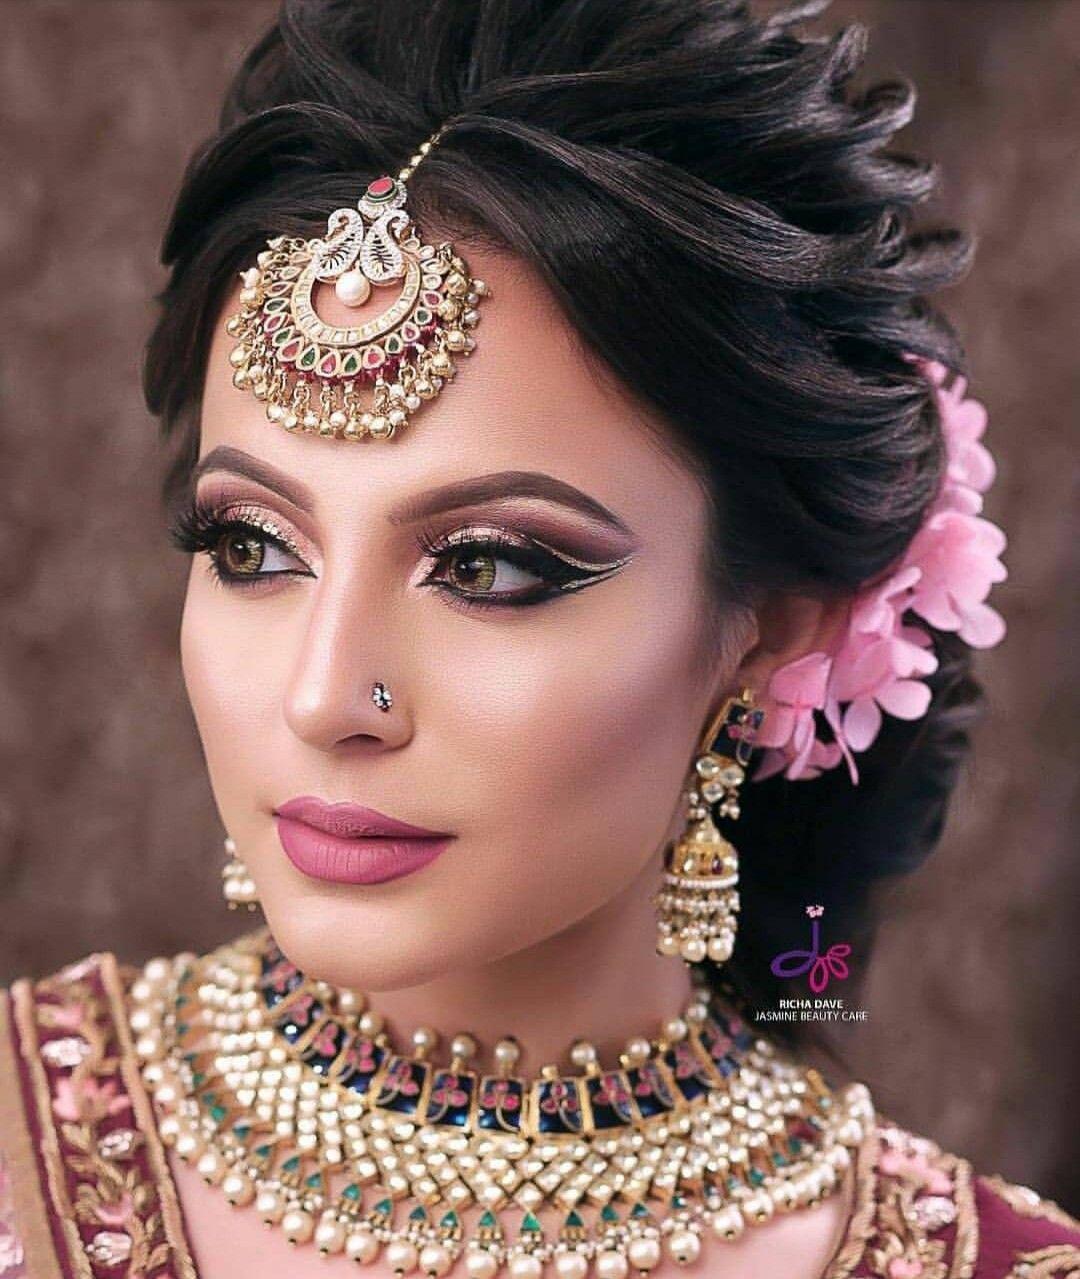 Pin by seema yadav on Bridal   Indian wedding hairstyles, Indian bridal hairstyles, Indian ...